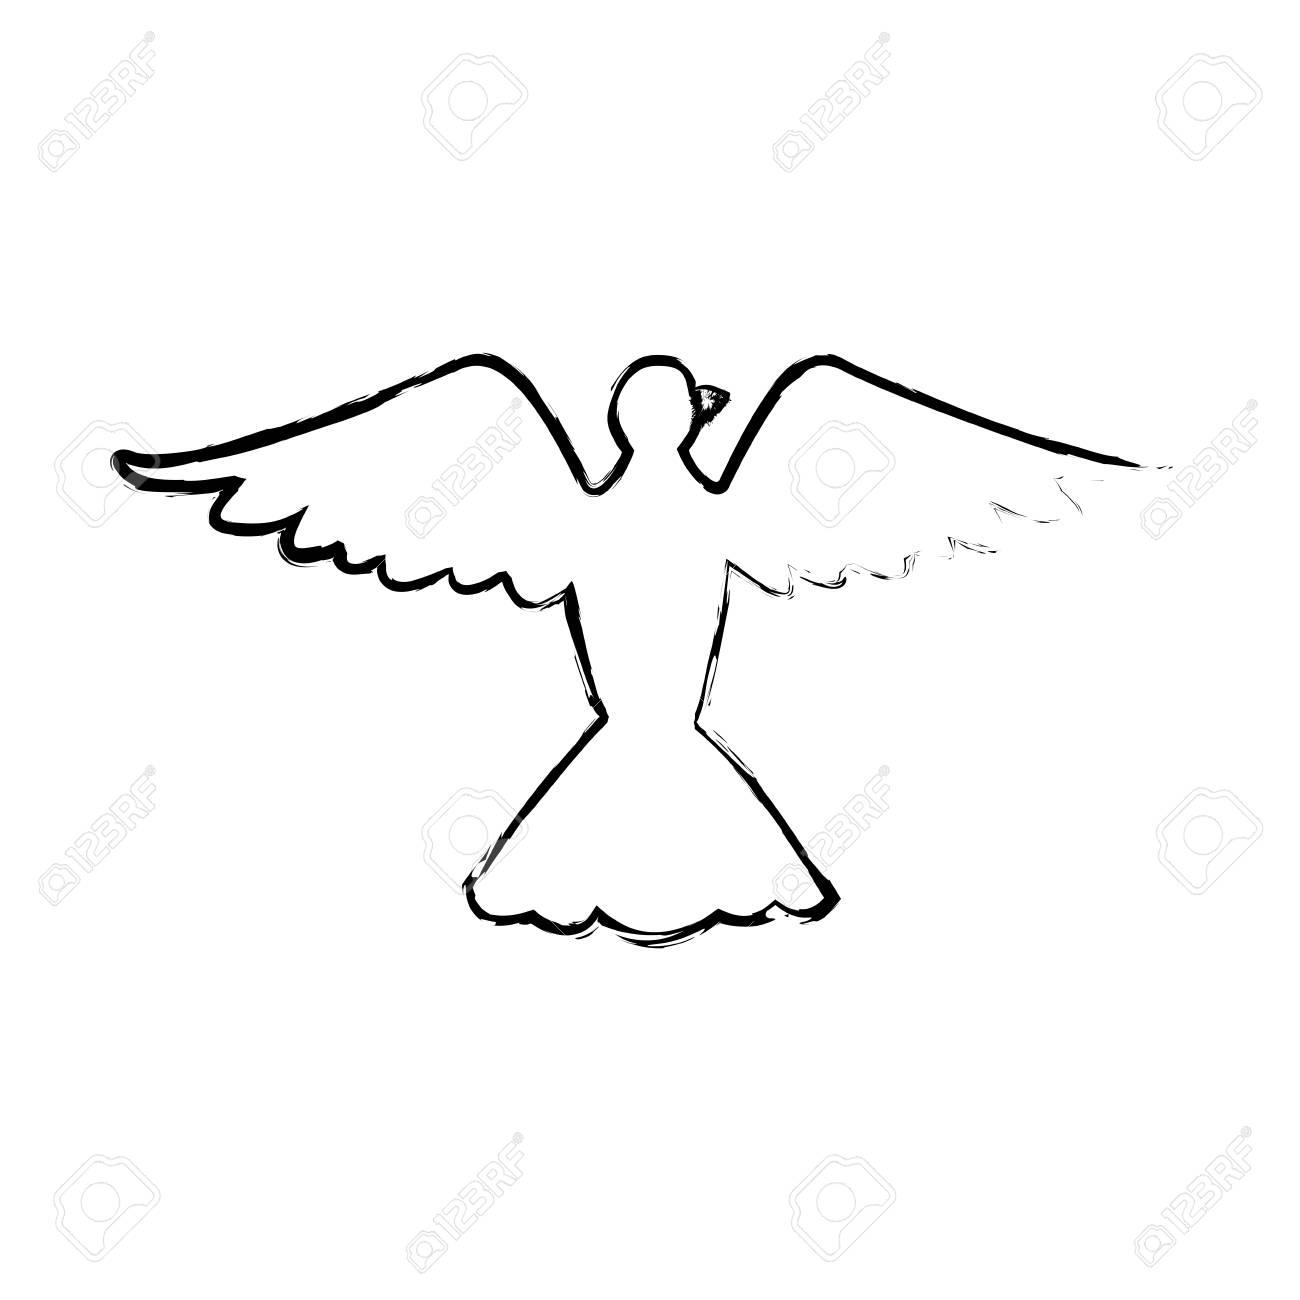 Passaro Pombo Liberdade Paz Asas Abertas Ilustracao Vetorial